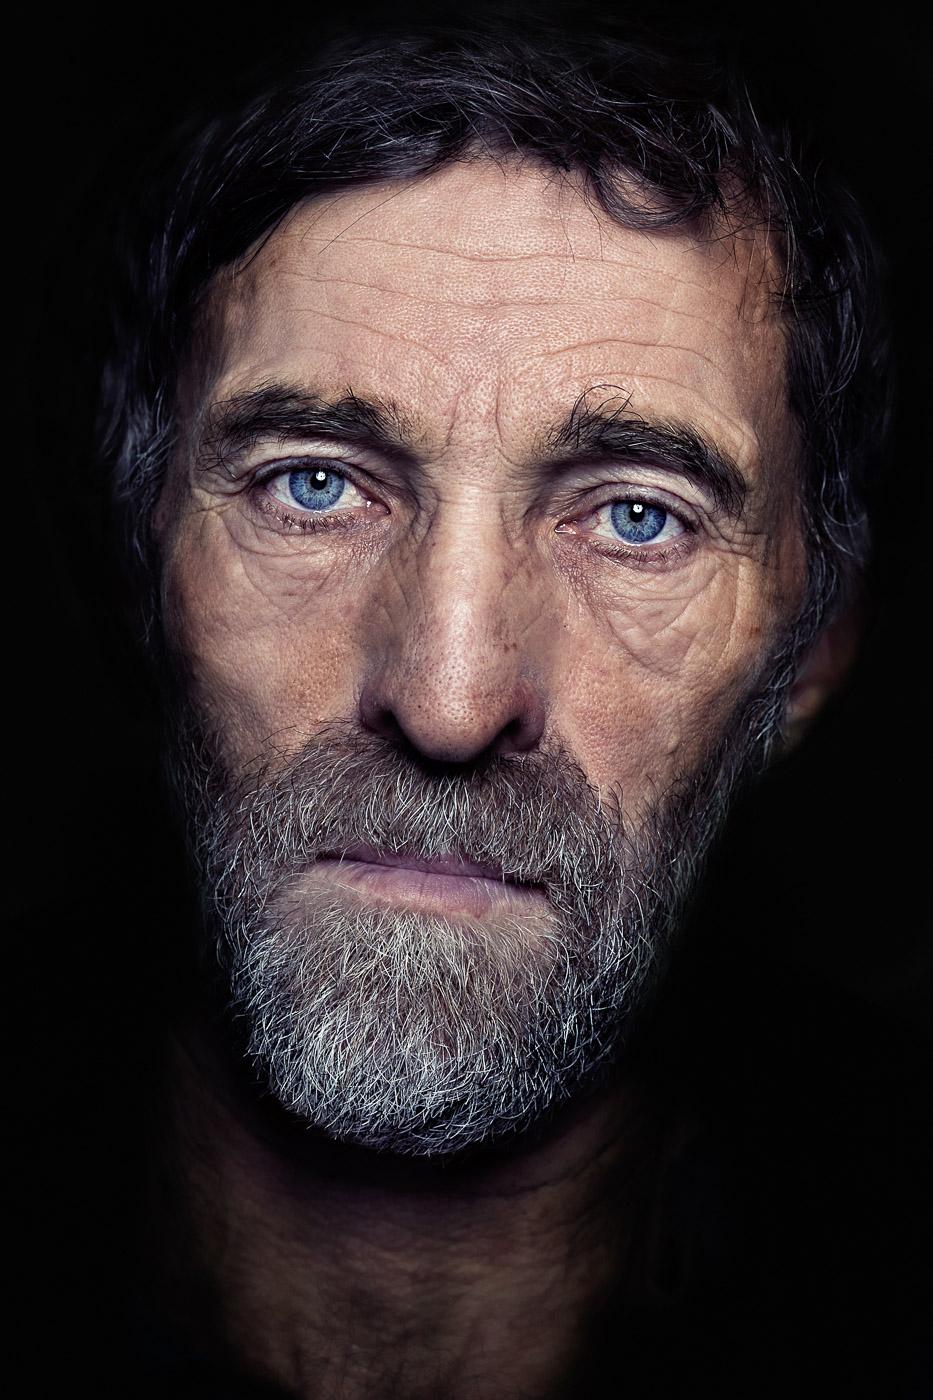 portreefotod portreed fotograaf Kristian Kruuser-1.jpg